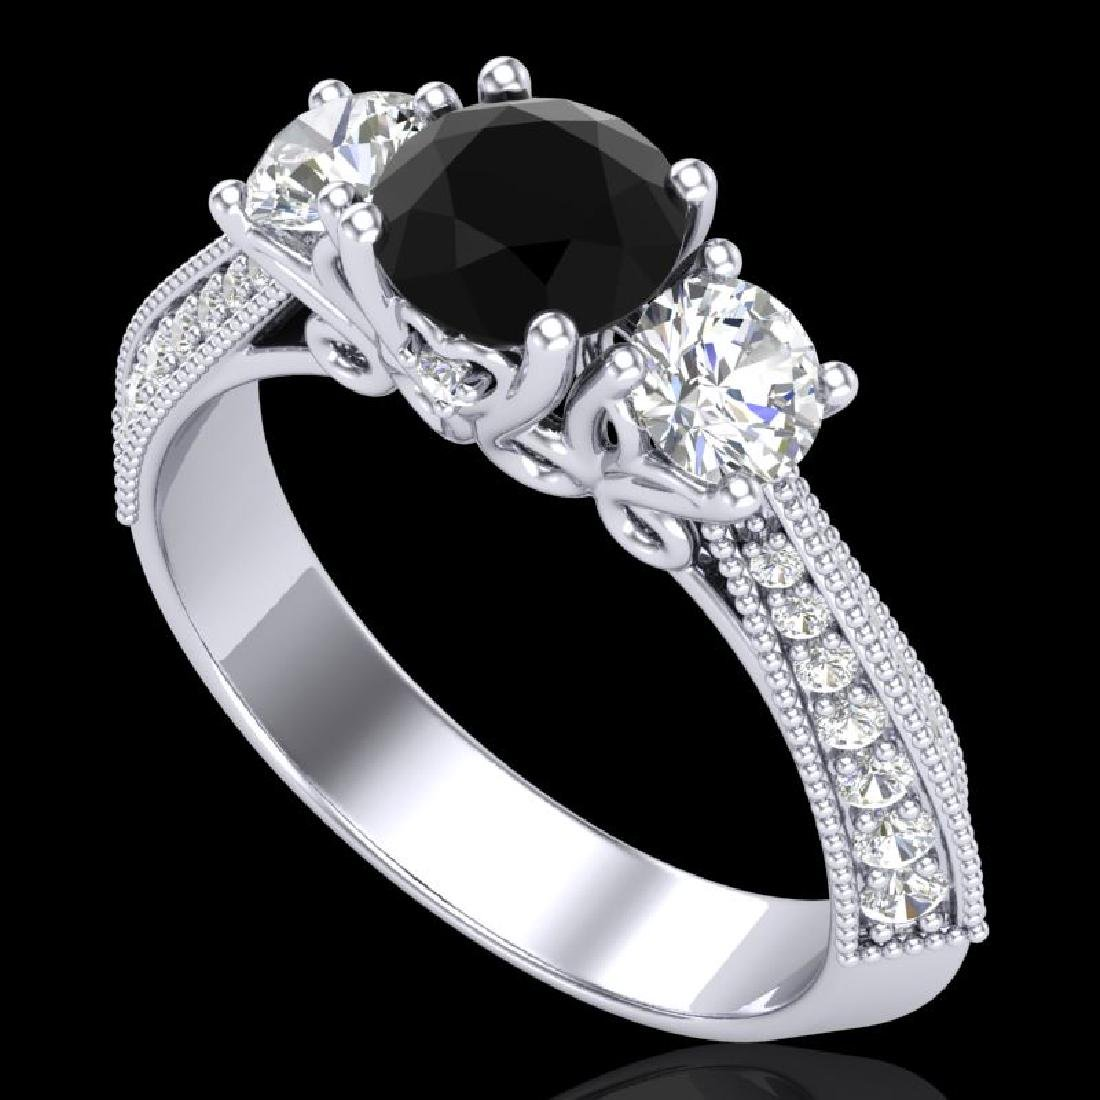 1.81 CTW Fancy Black Diamond Solitaire Art Deco 3 Stone